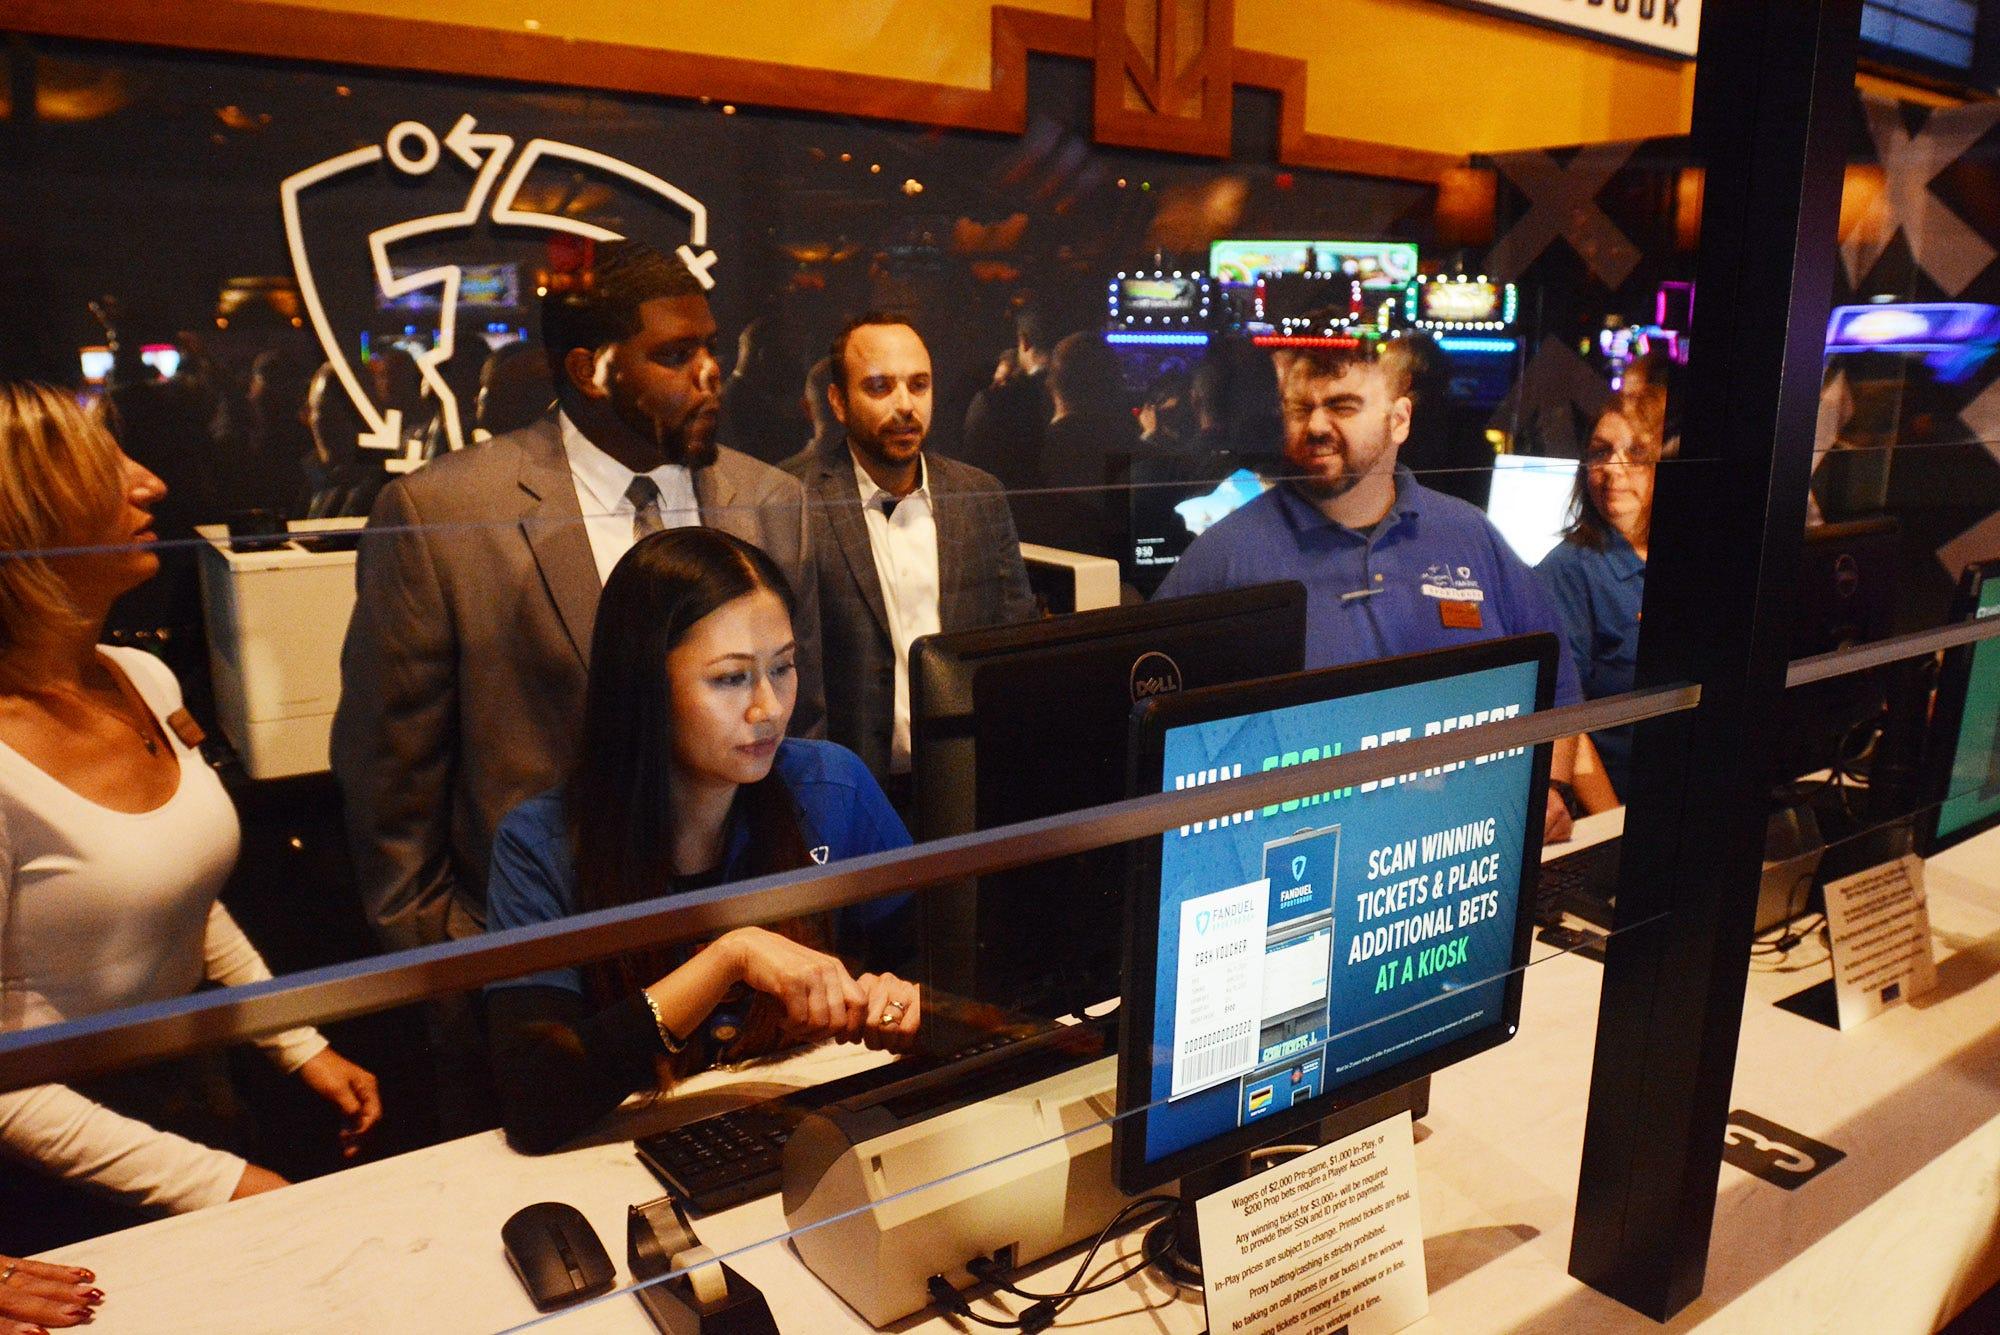 Sports betting begins at Mohegan Sun Casino